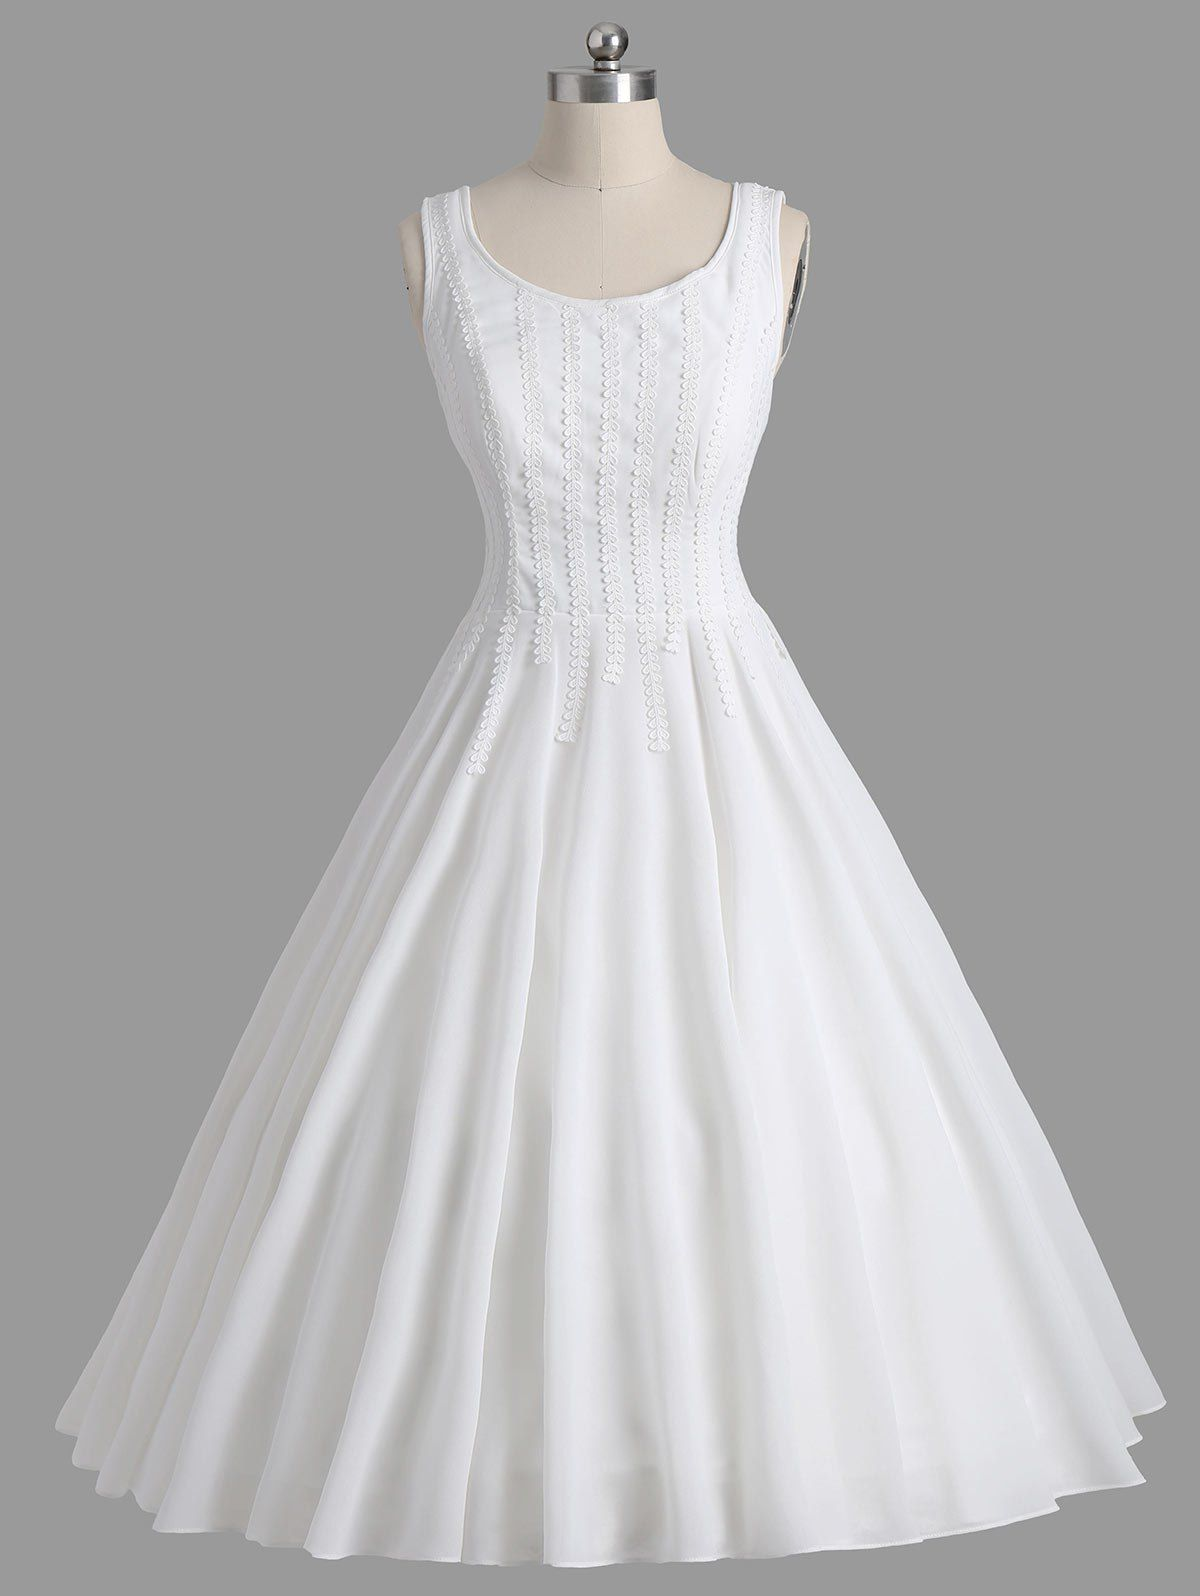 Lace Panel Sleeveless Formal 1950 Prom Dress | Kleider